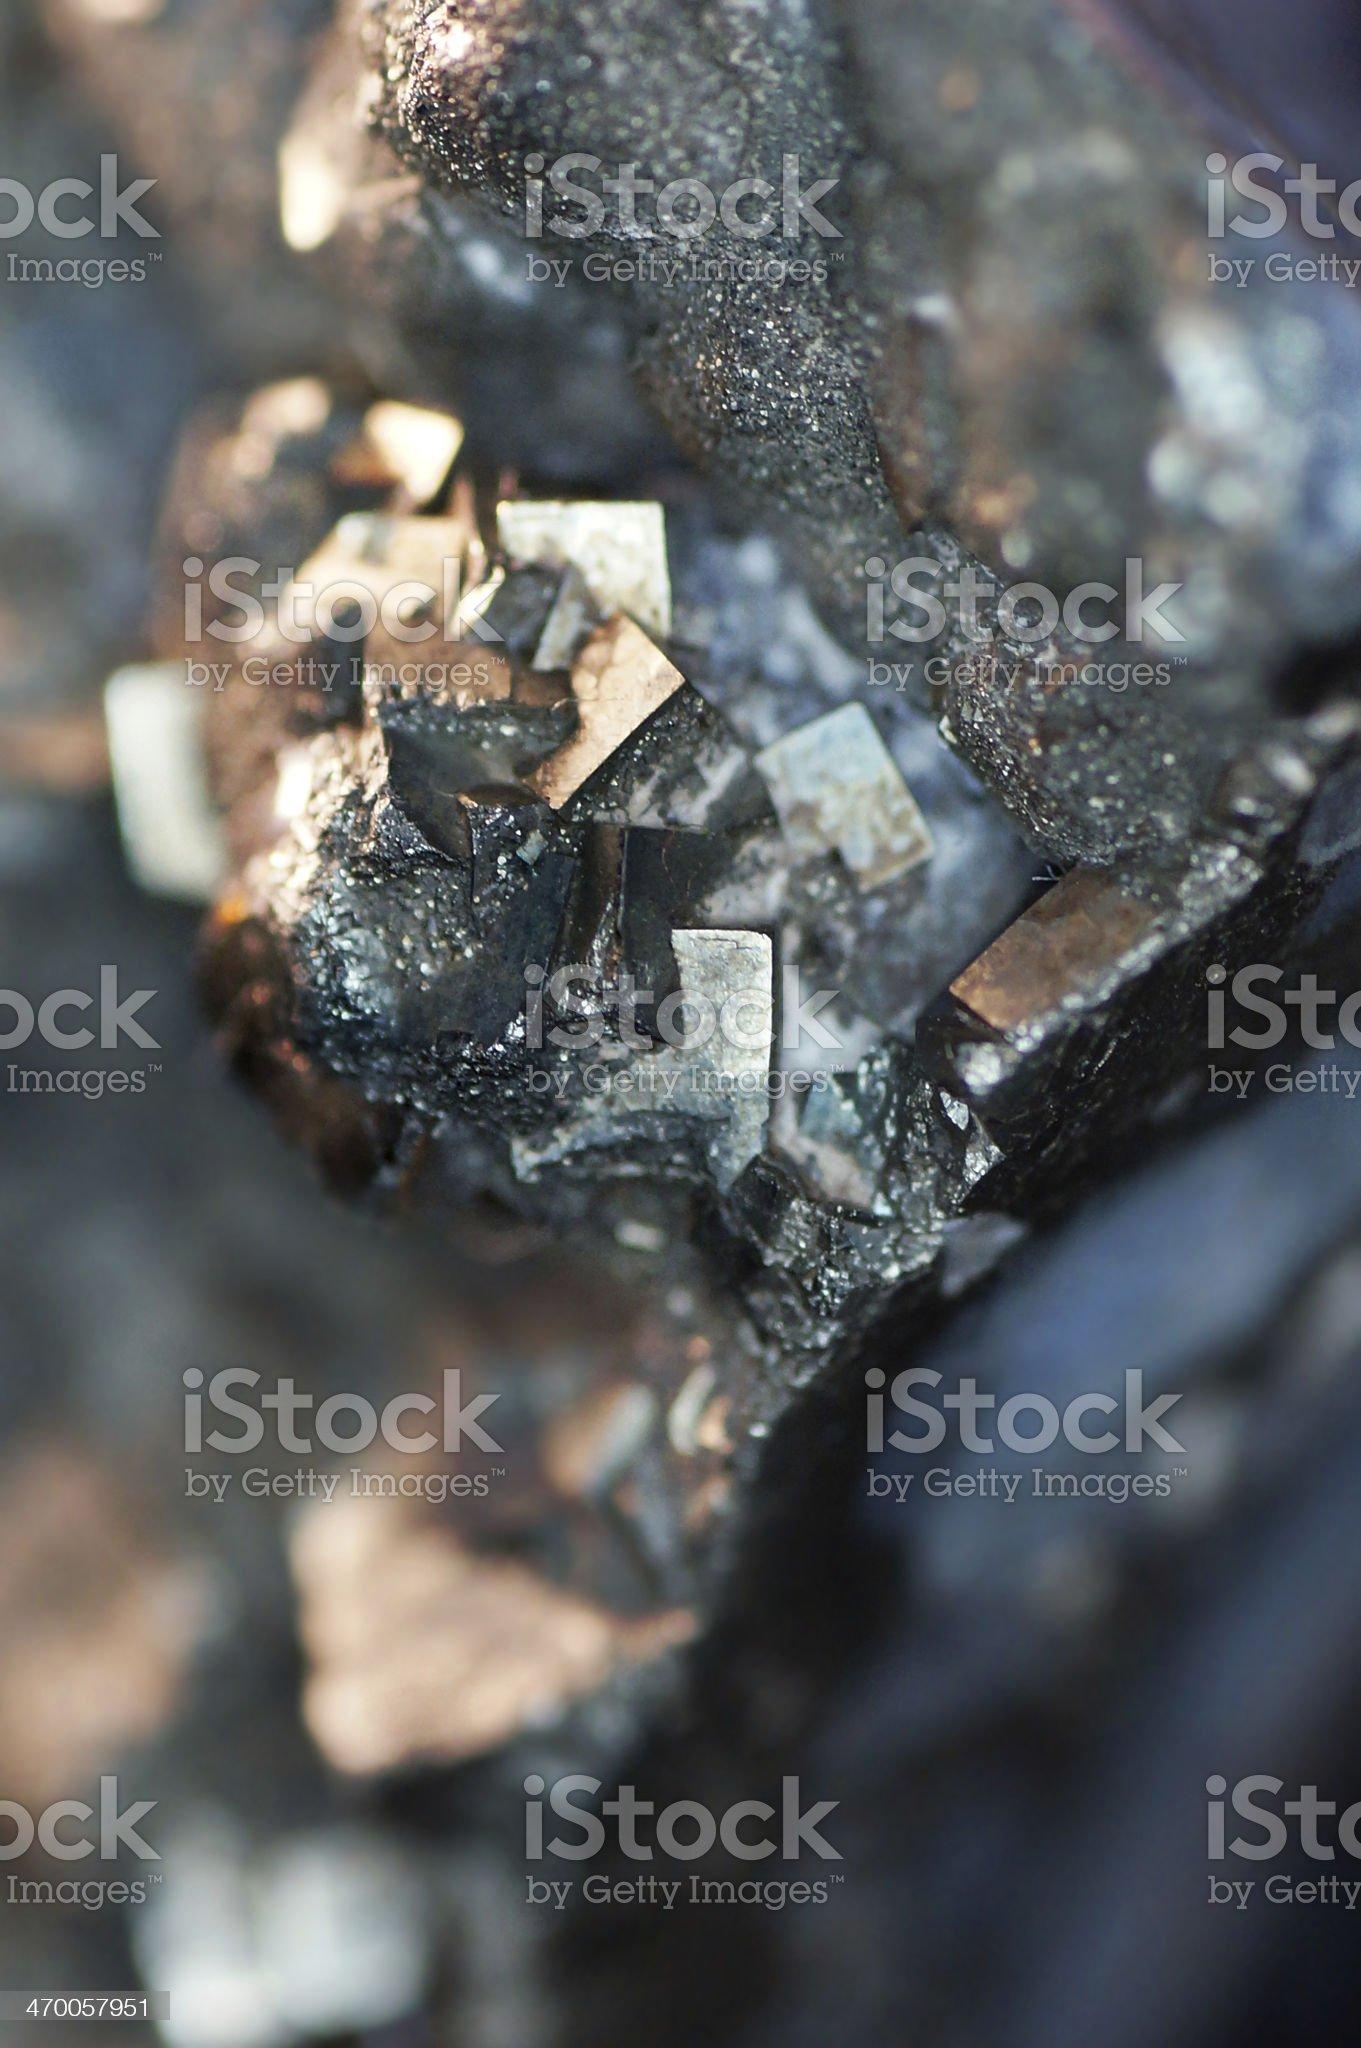 Macro hematite & quartz minerals royalty-free stock photo